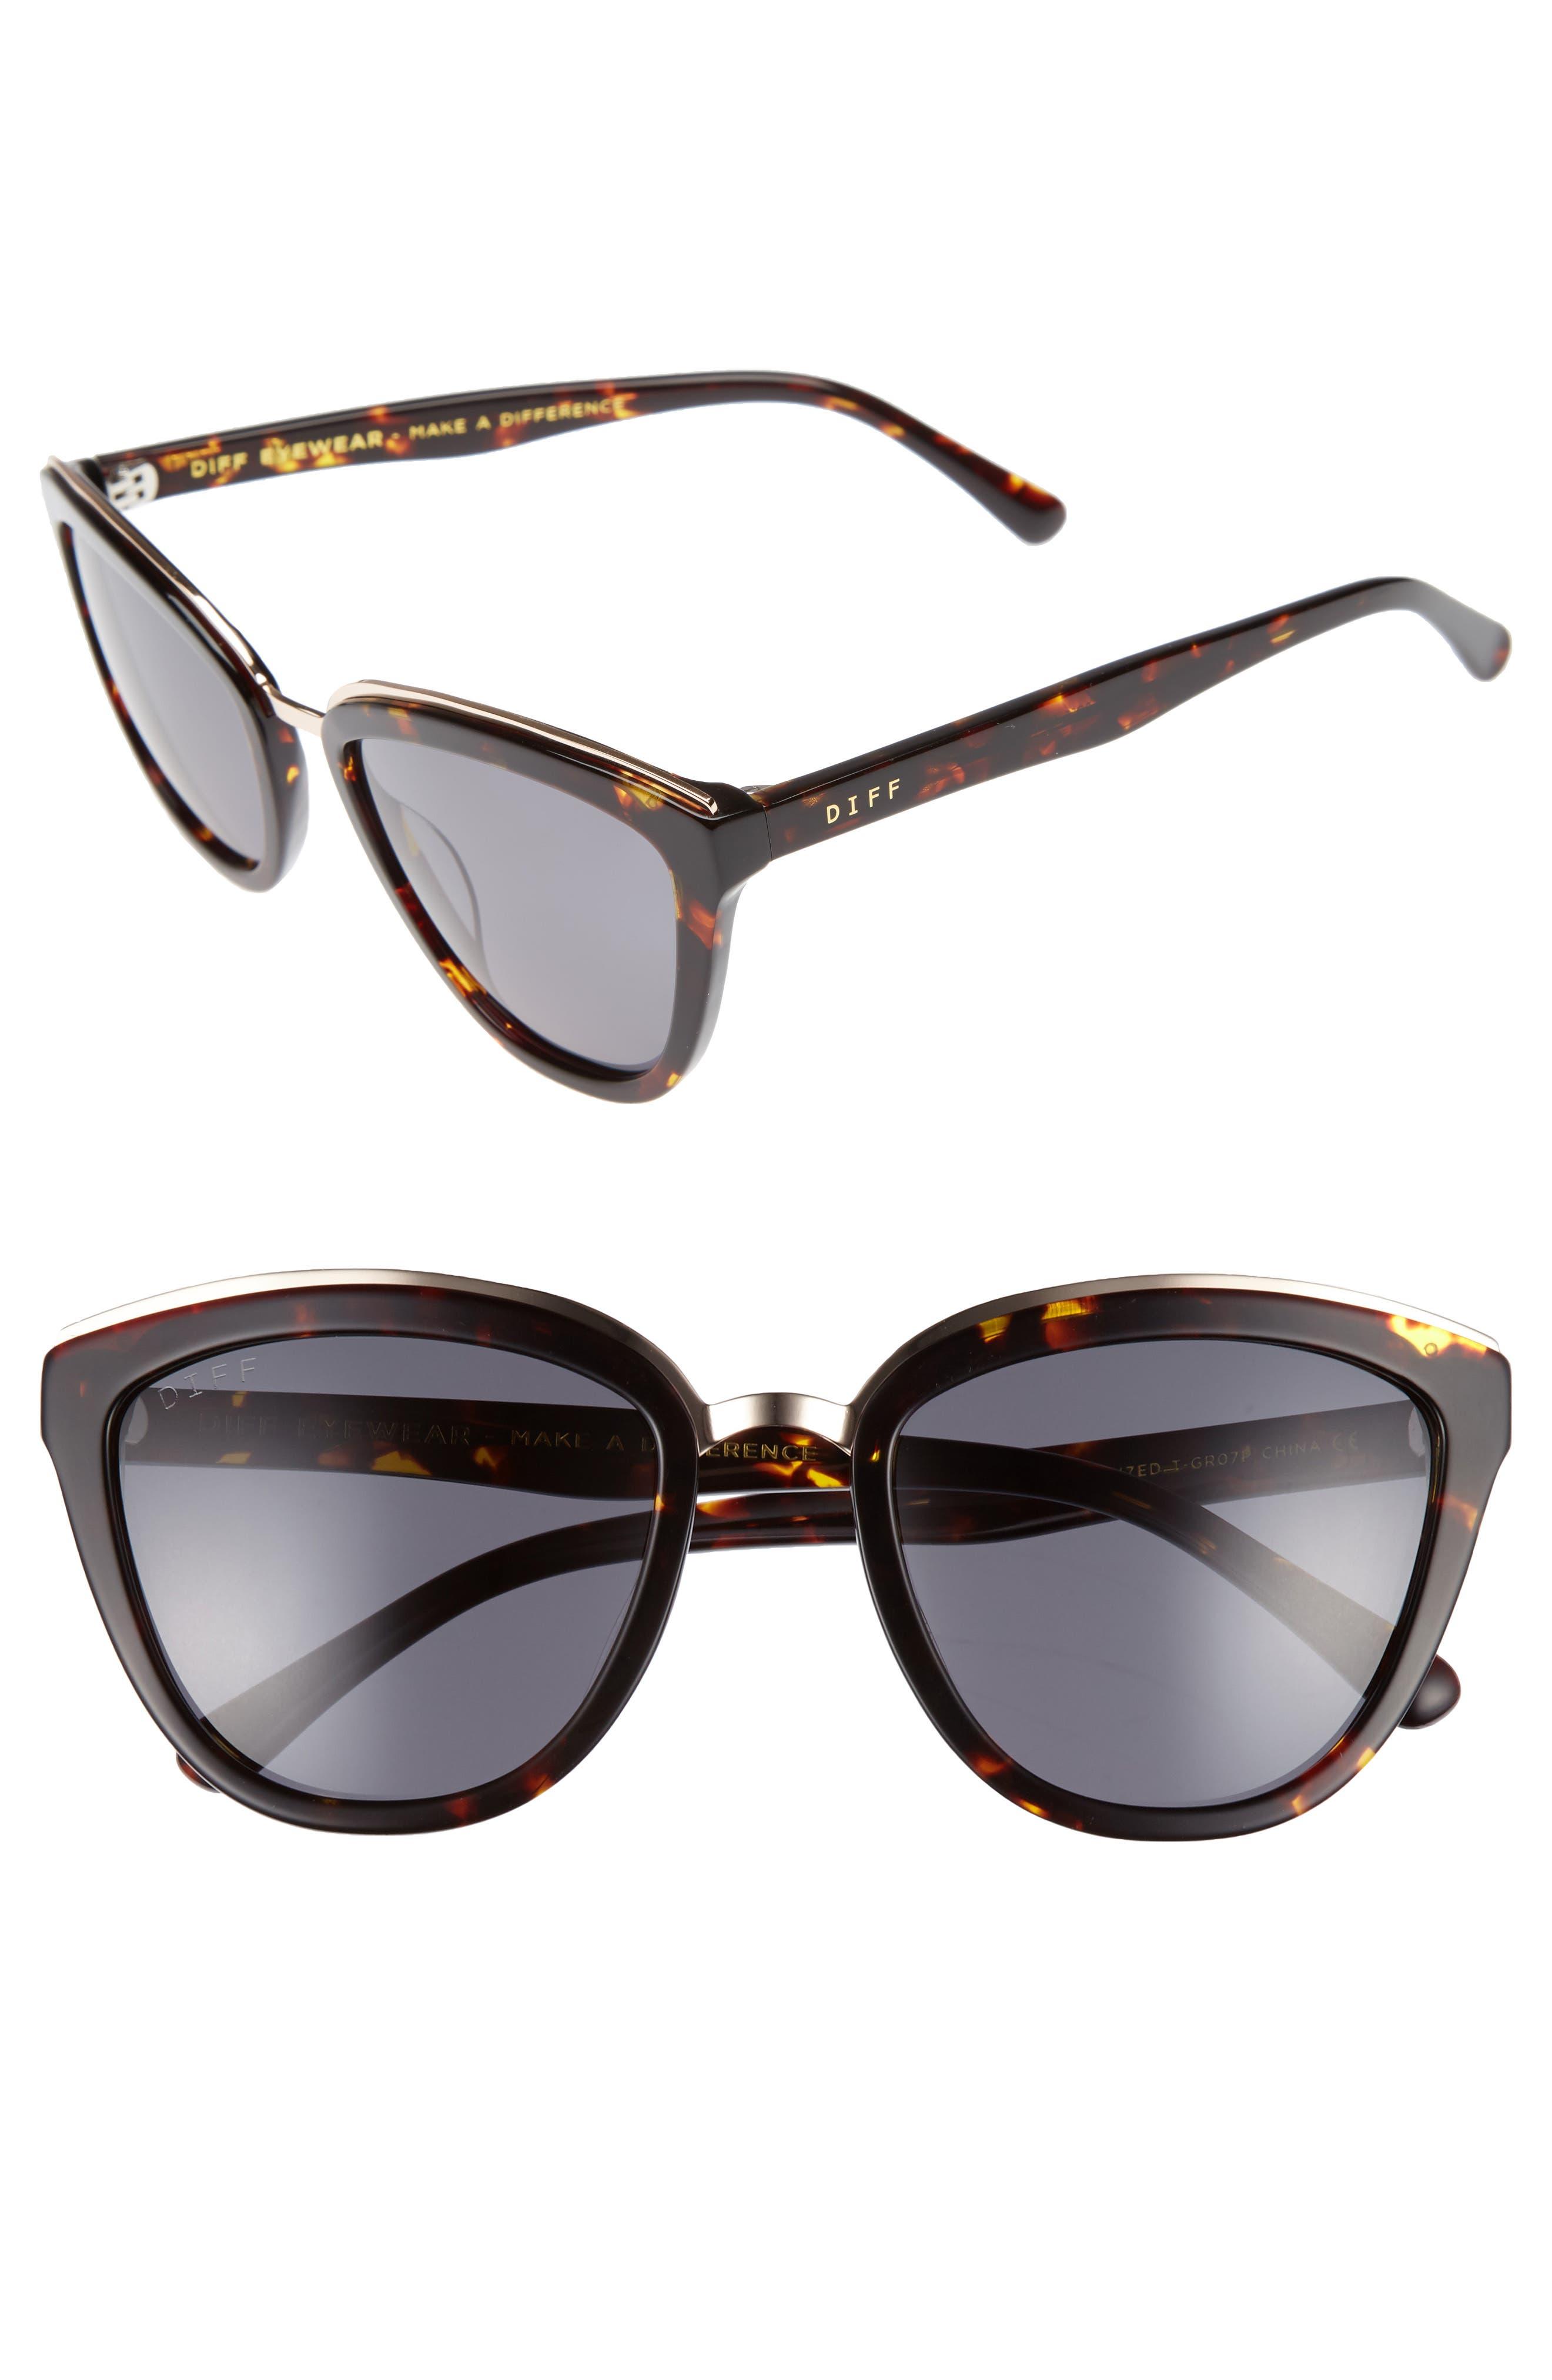 Main Image - DIFF Rose 55mm Polarized Mirrored Sunglasses